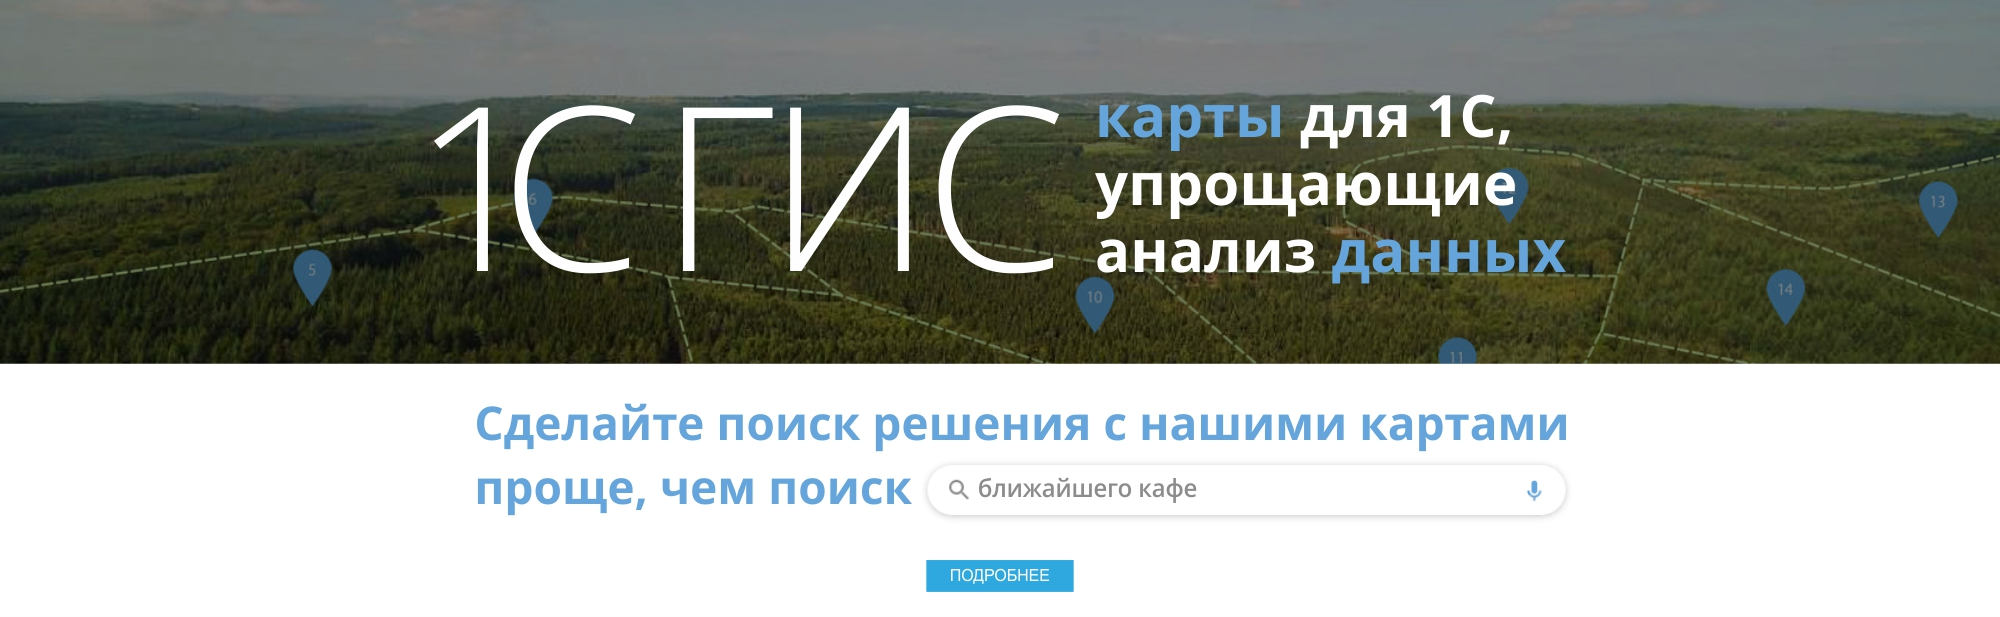 gis.1cps.ru